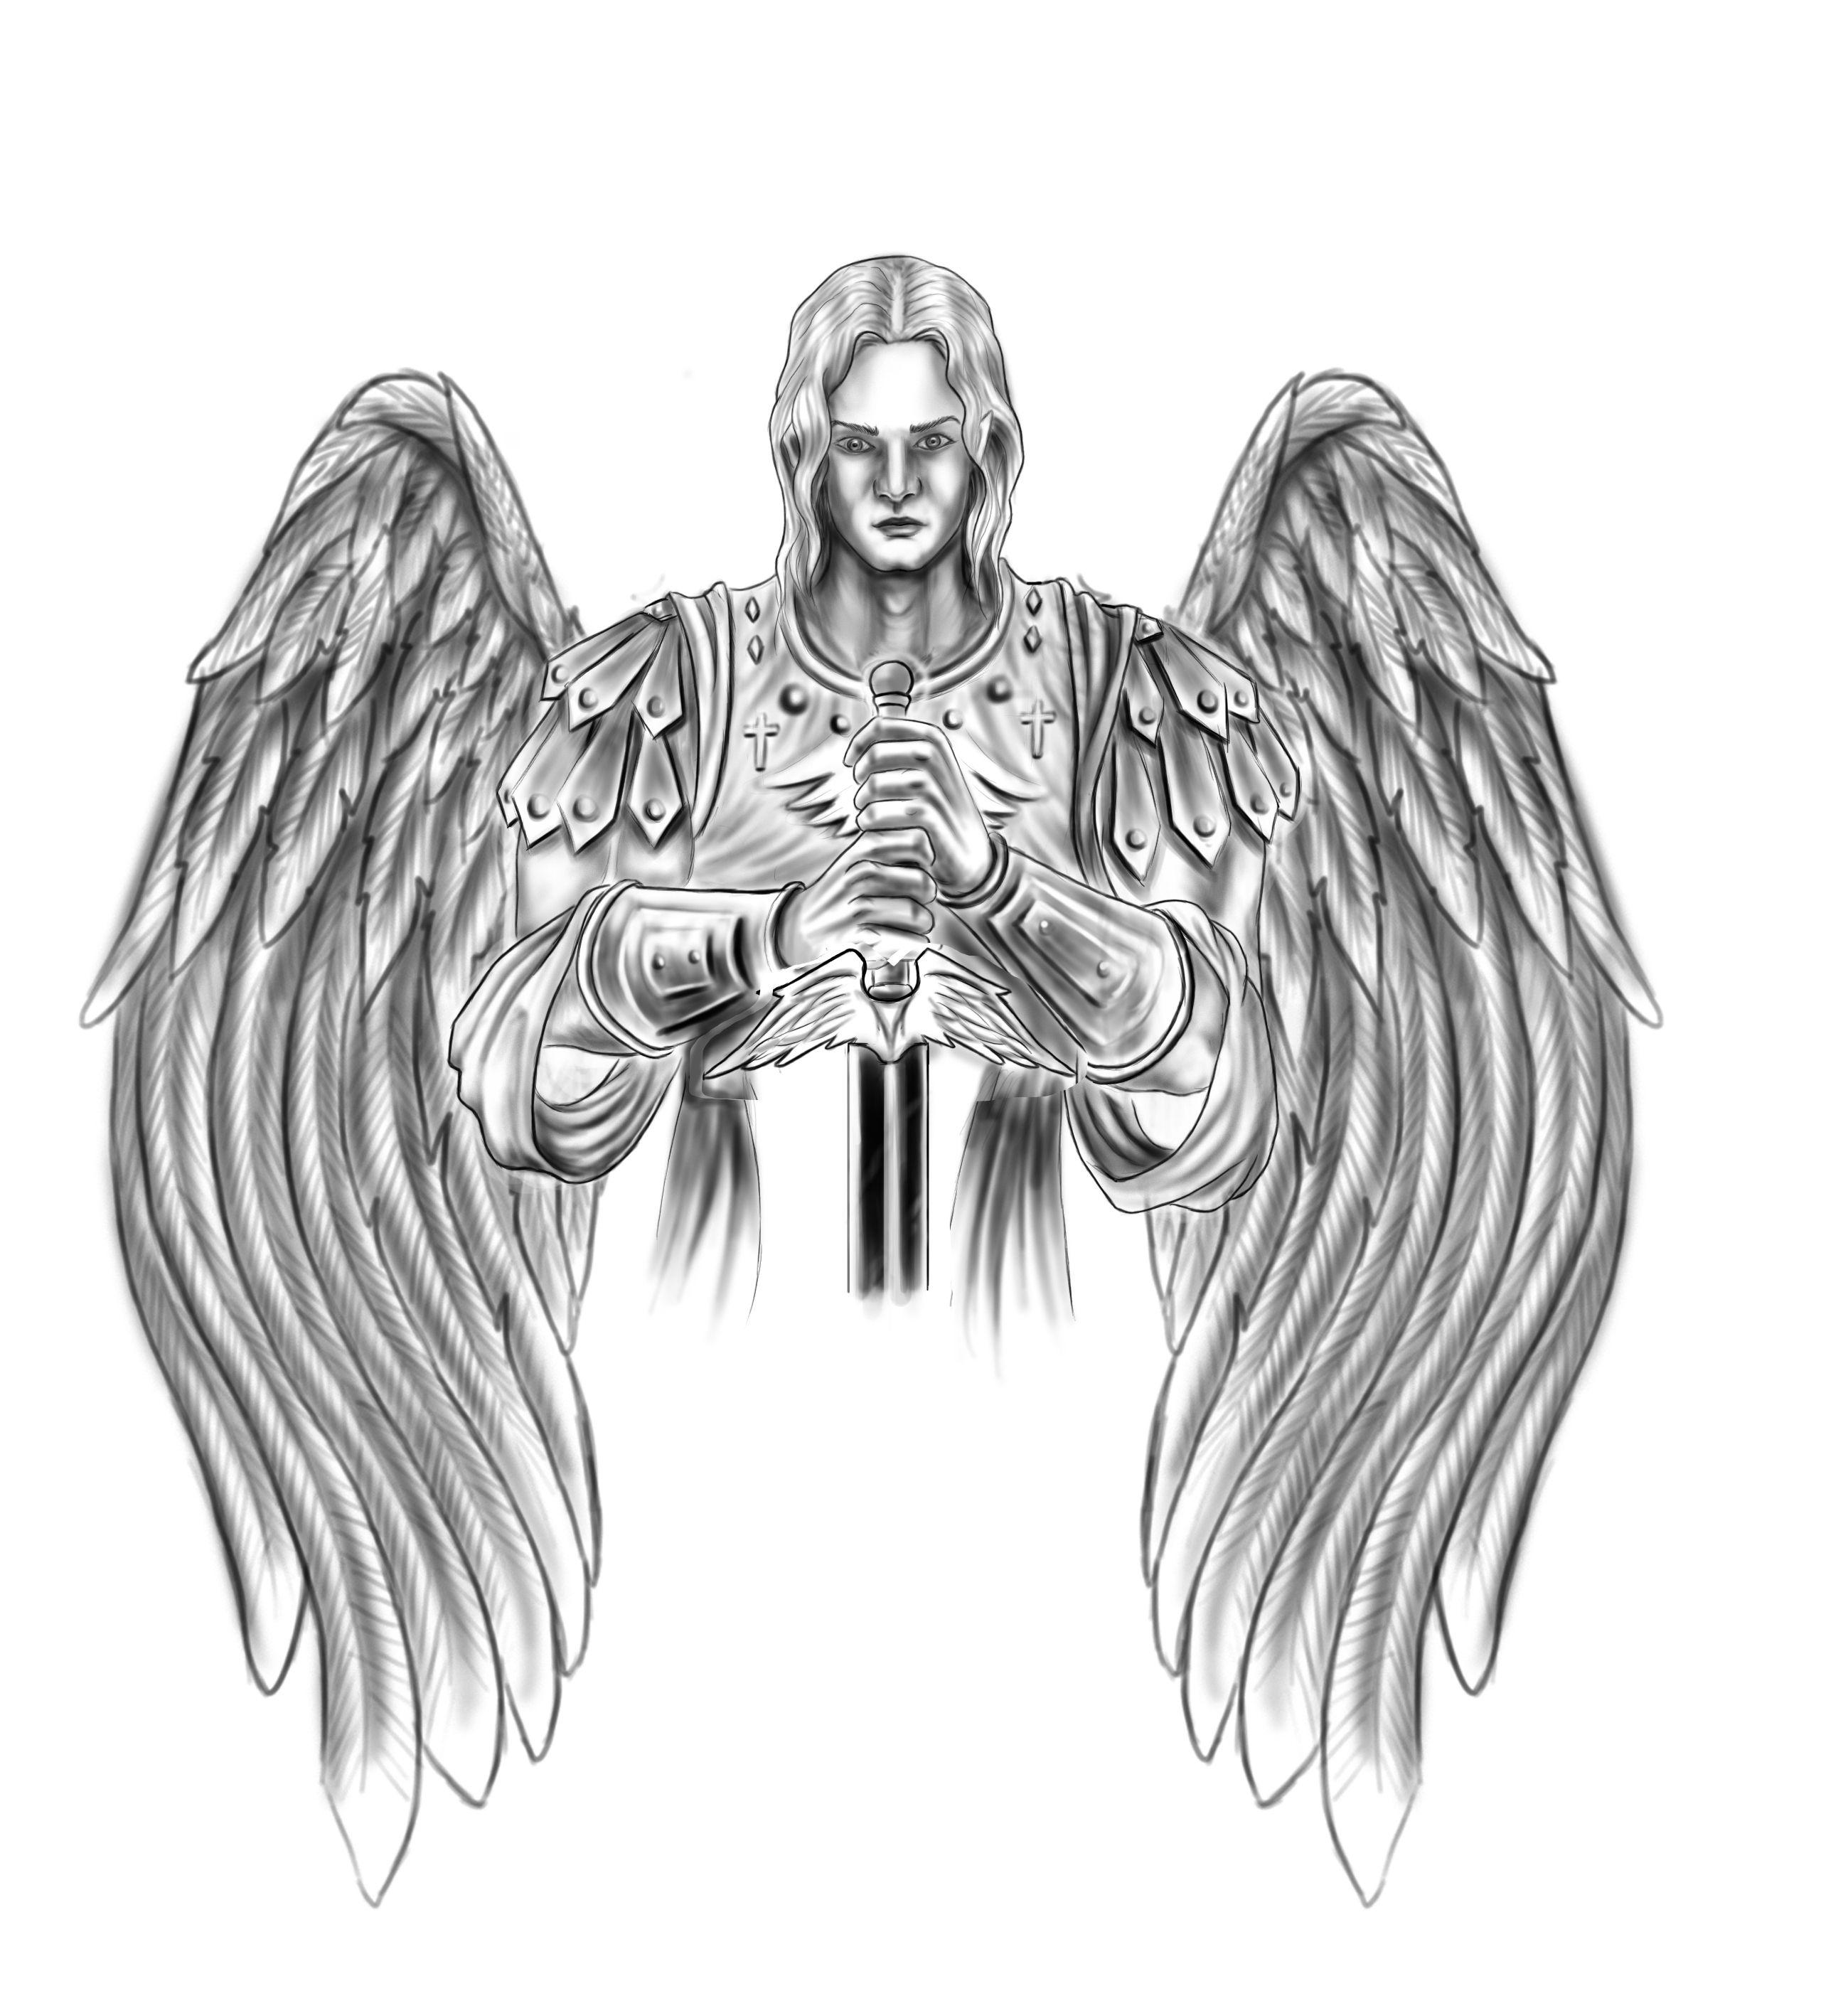 guardian angel tattoo tattoo concept artwork pinterest. Black Bedroom Furniture Sets. Home Design Ideas